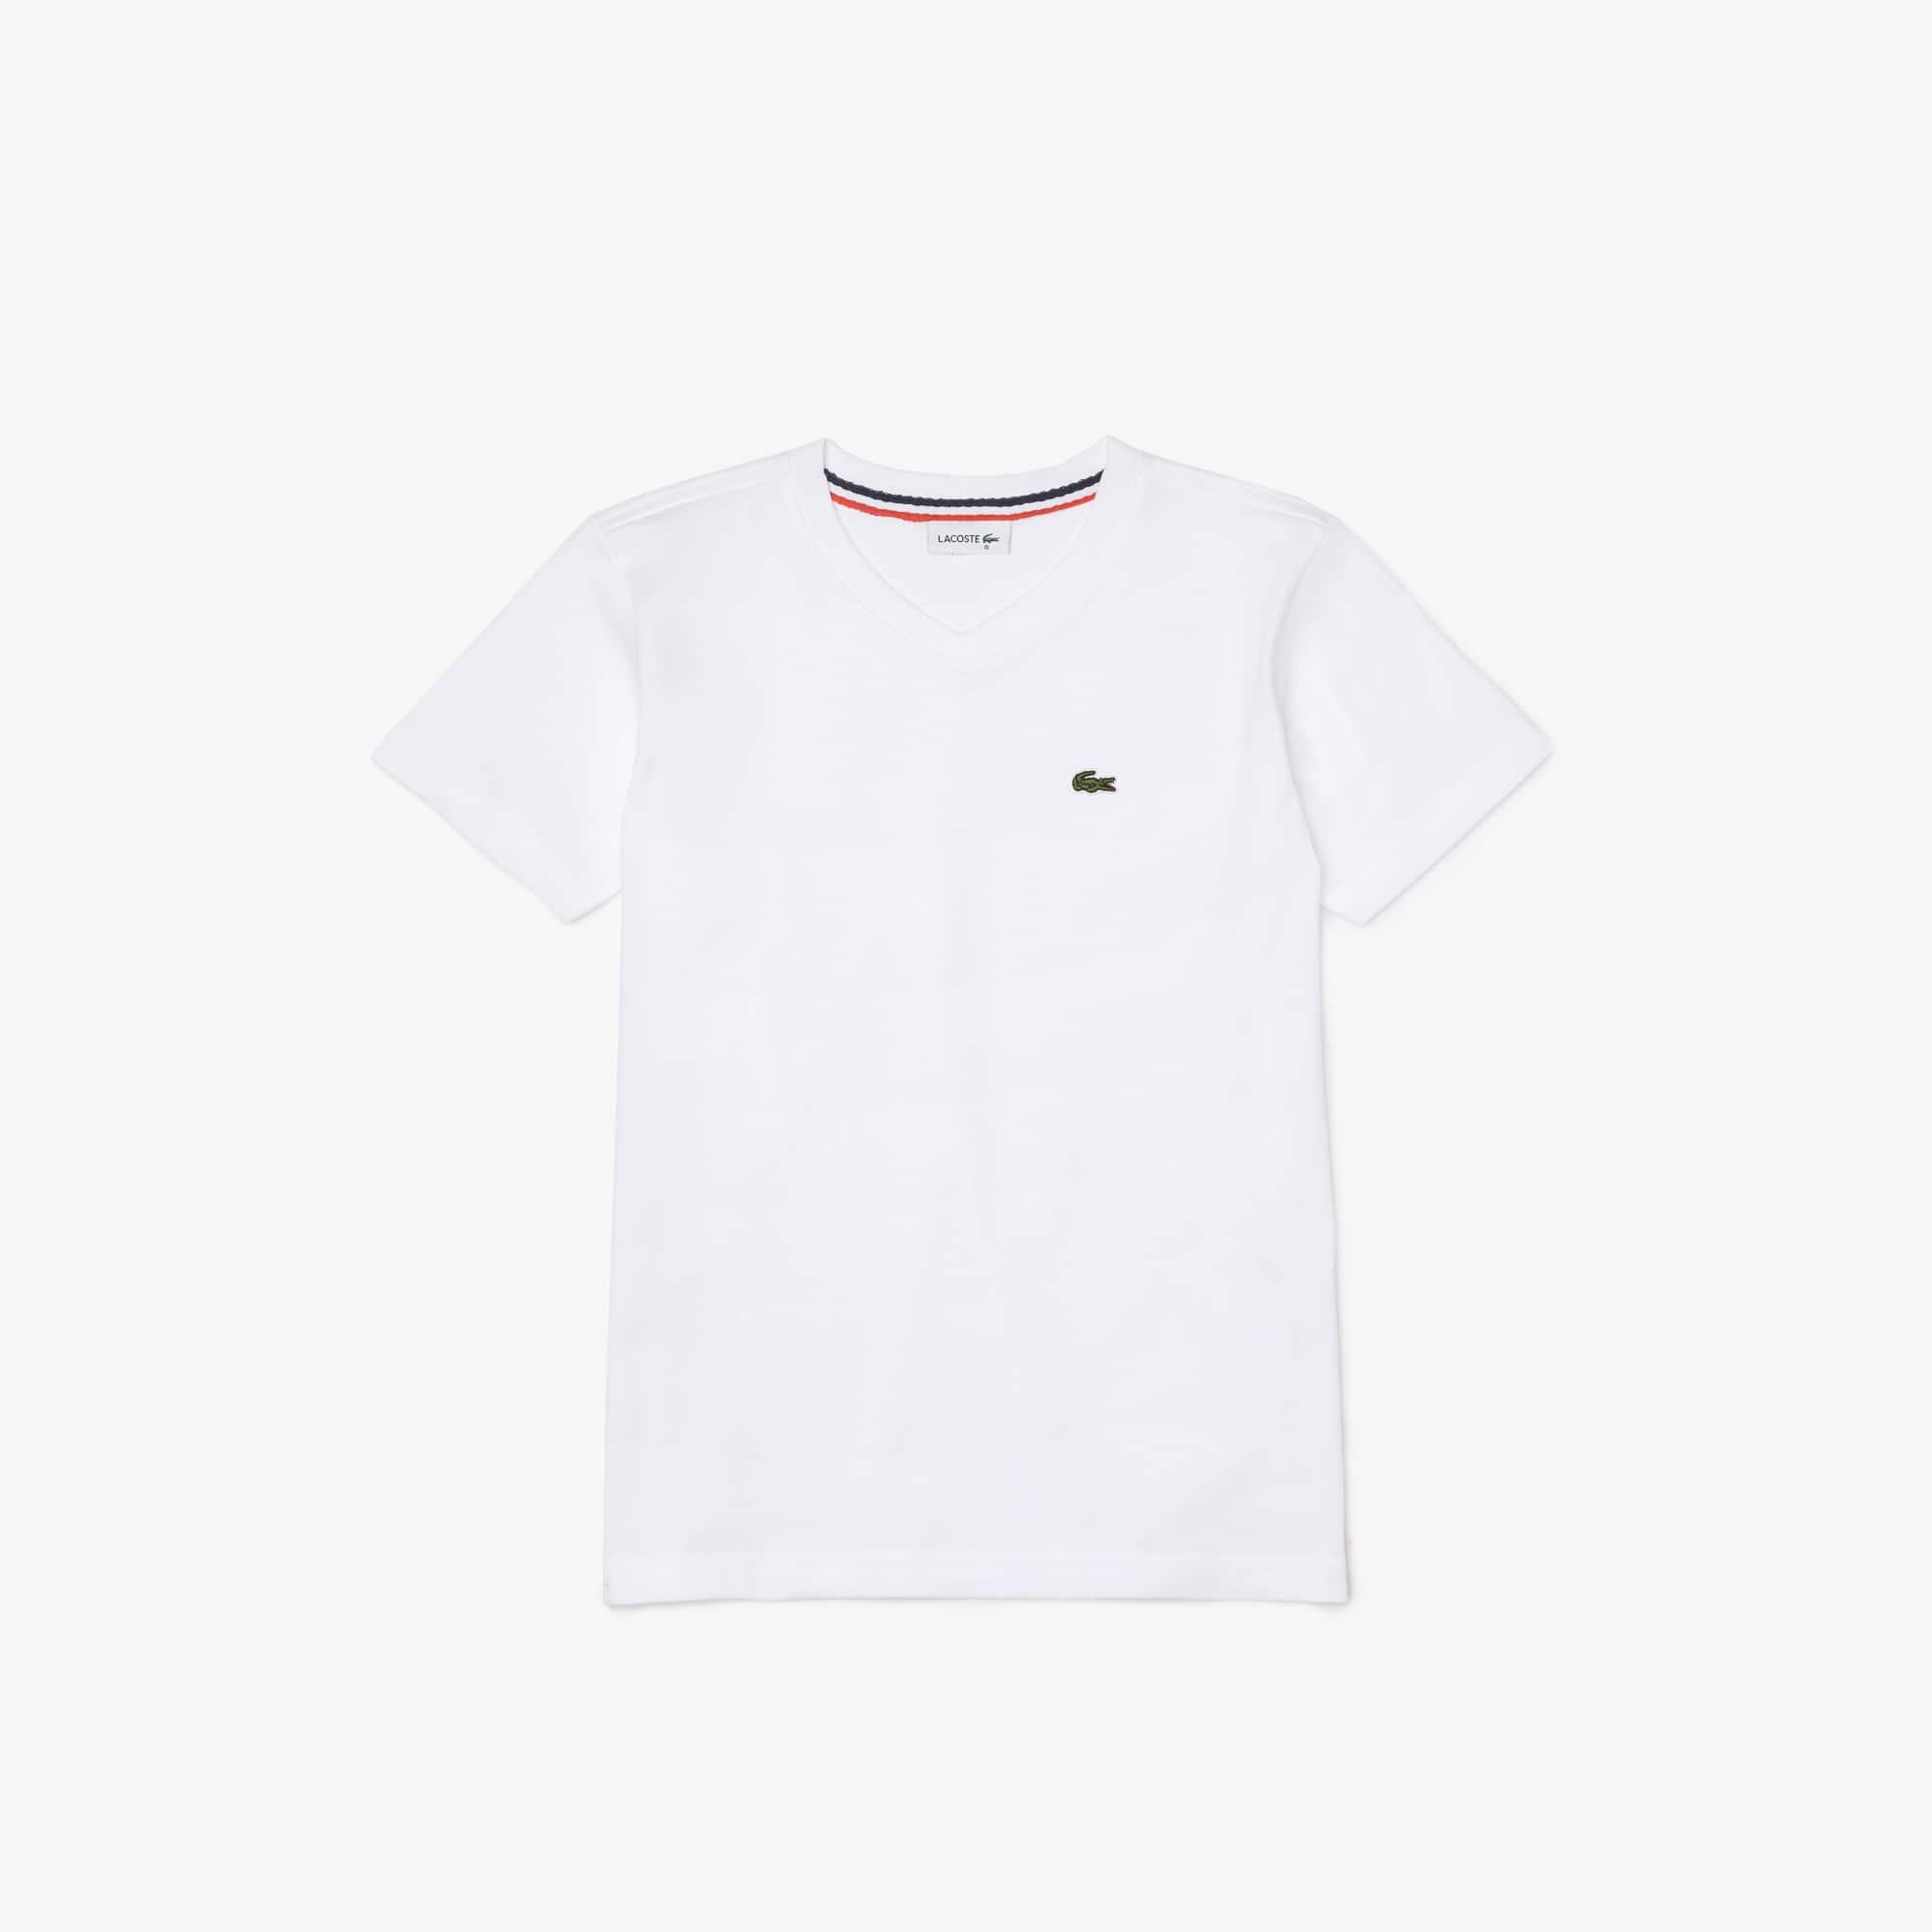 Boys' V-Neck Cotton T-shirt